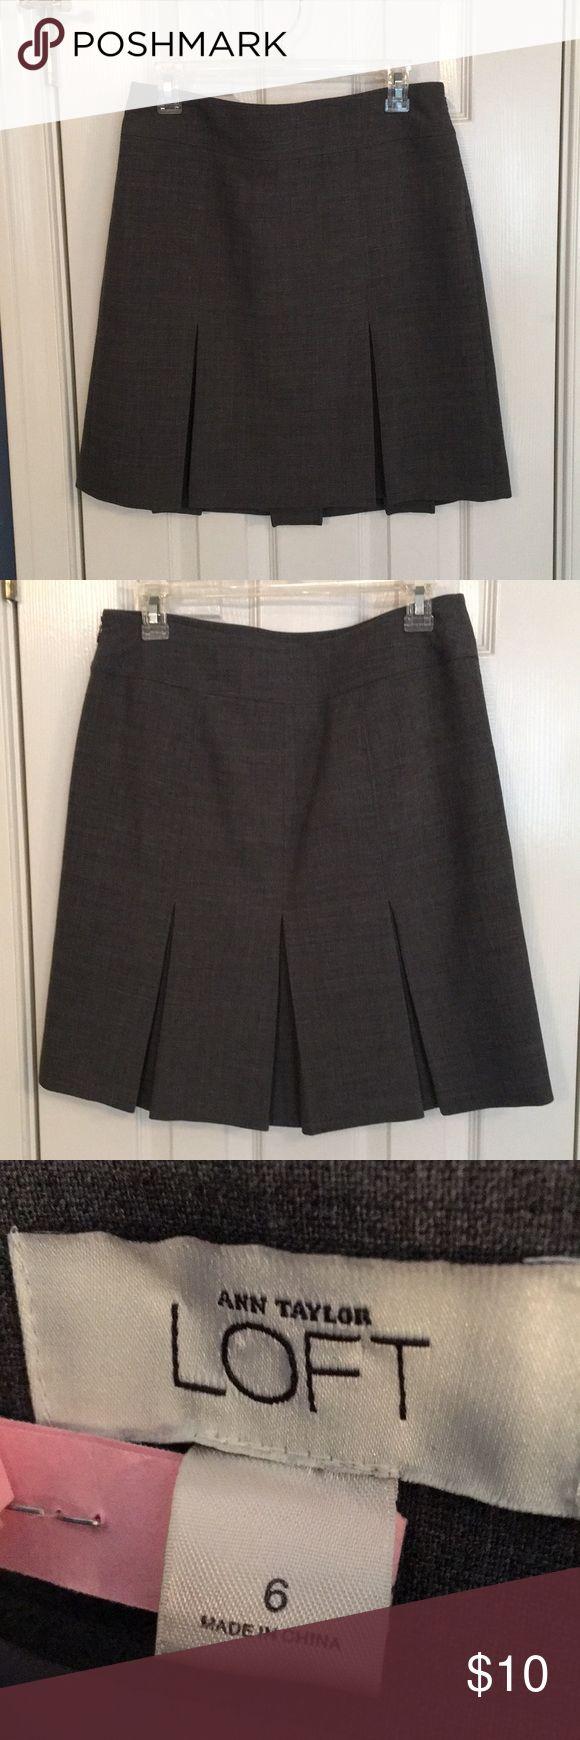 Ann Taylor Loft Career Tweed Ruffled Skirt Size 6 Ann Taylor Loft Career Tweed Ruffled Skirt Size 6 Ann Taylor Loft Skirts Mini